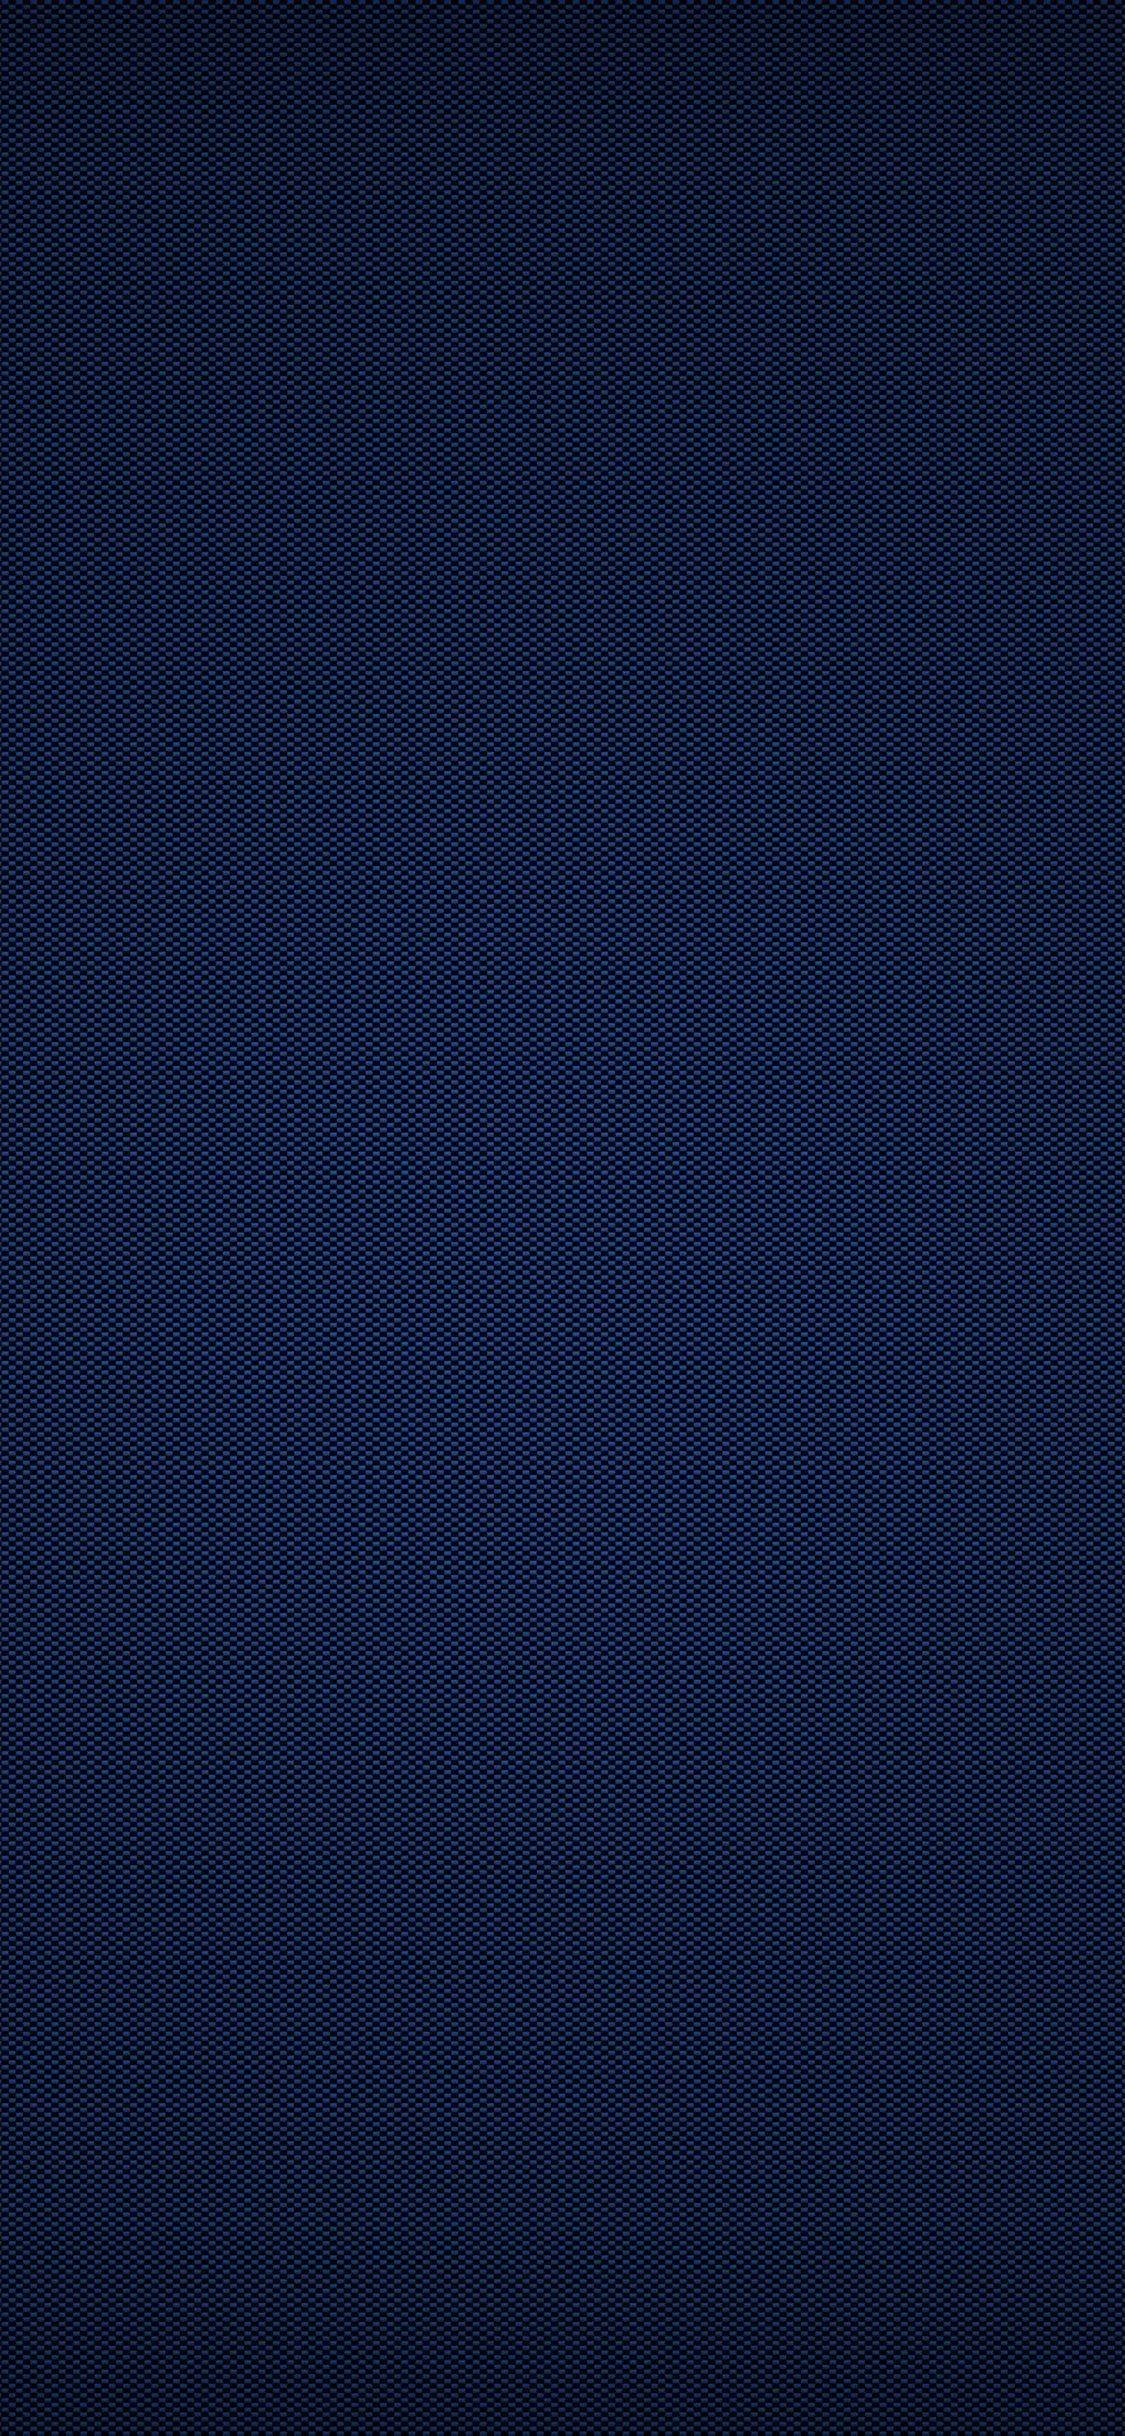 Best Of Us Navy Iphone Wallpaper Blue Grey Wallpaper Camo Wallpaper Blue Wallpapers